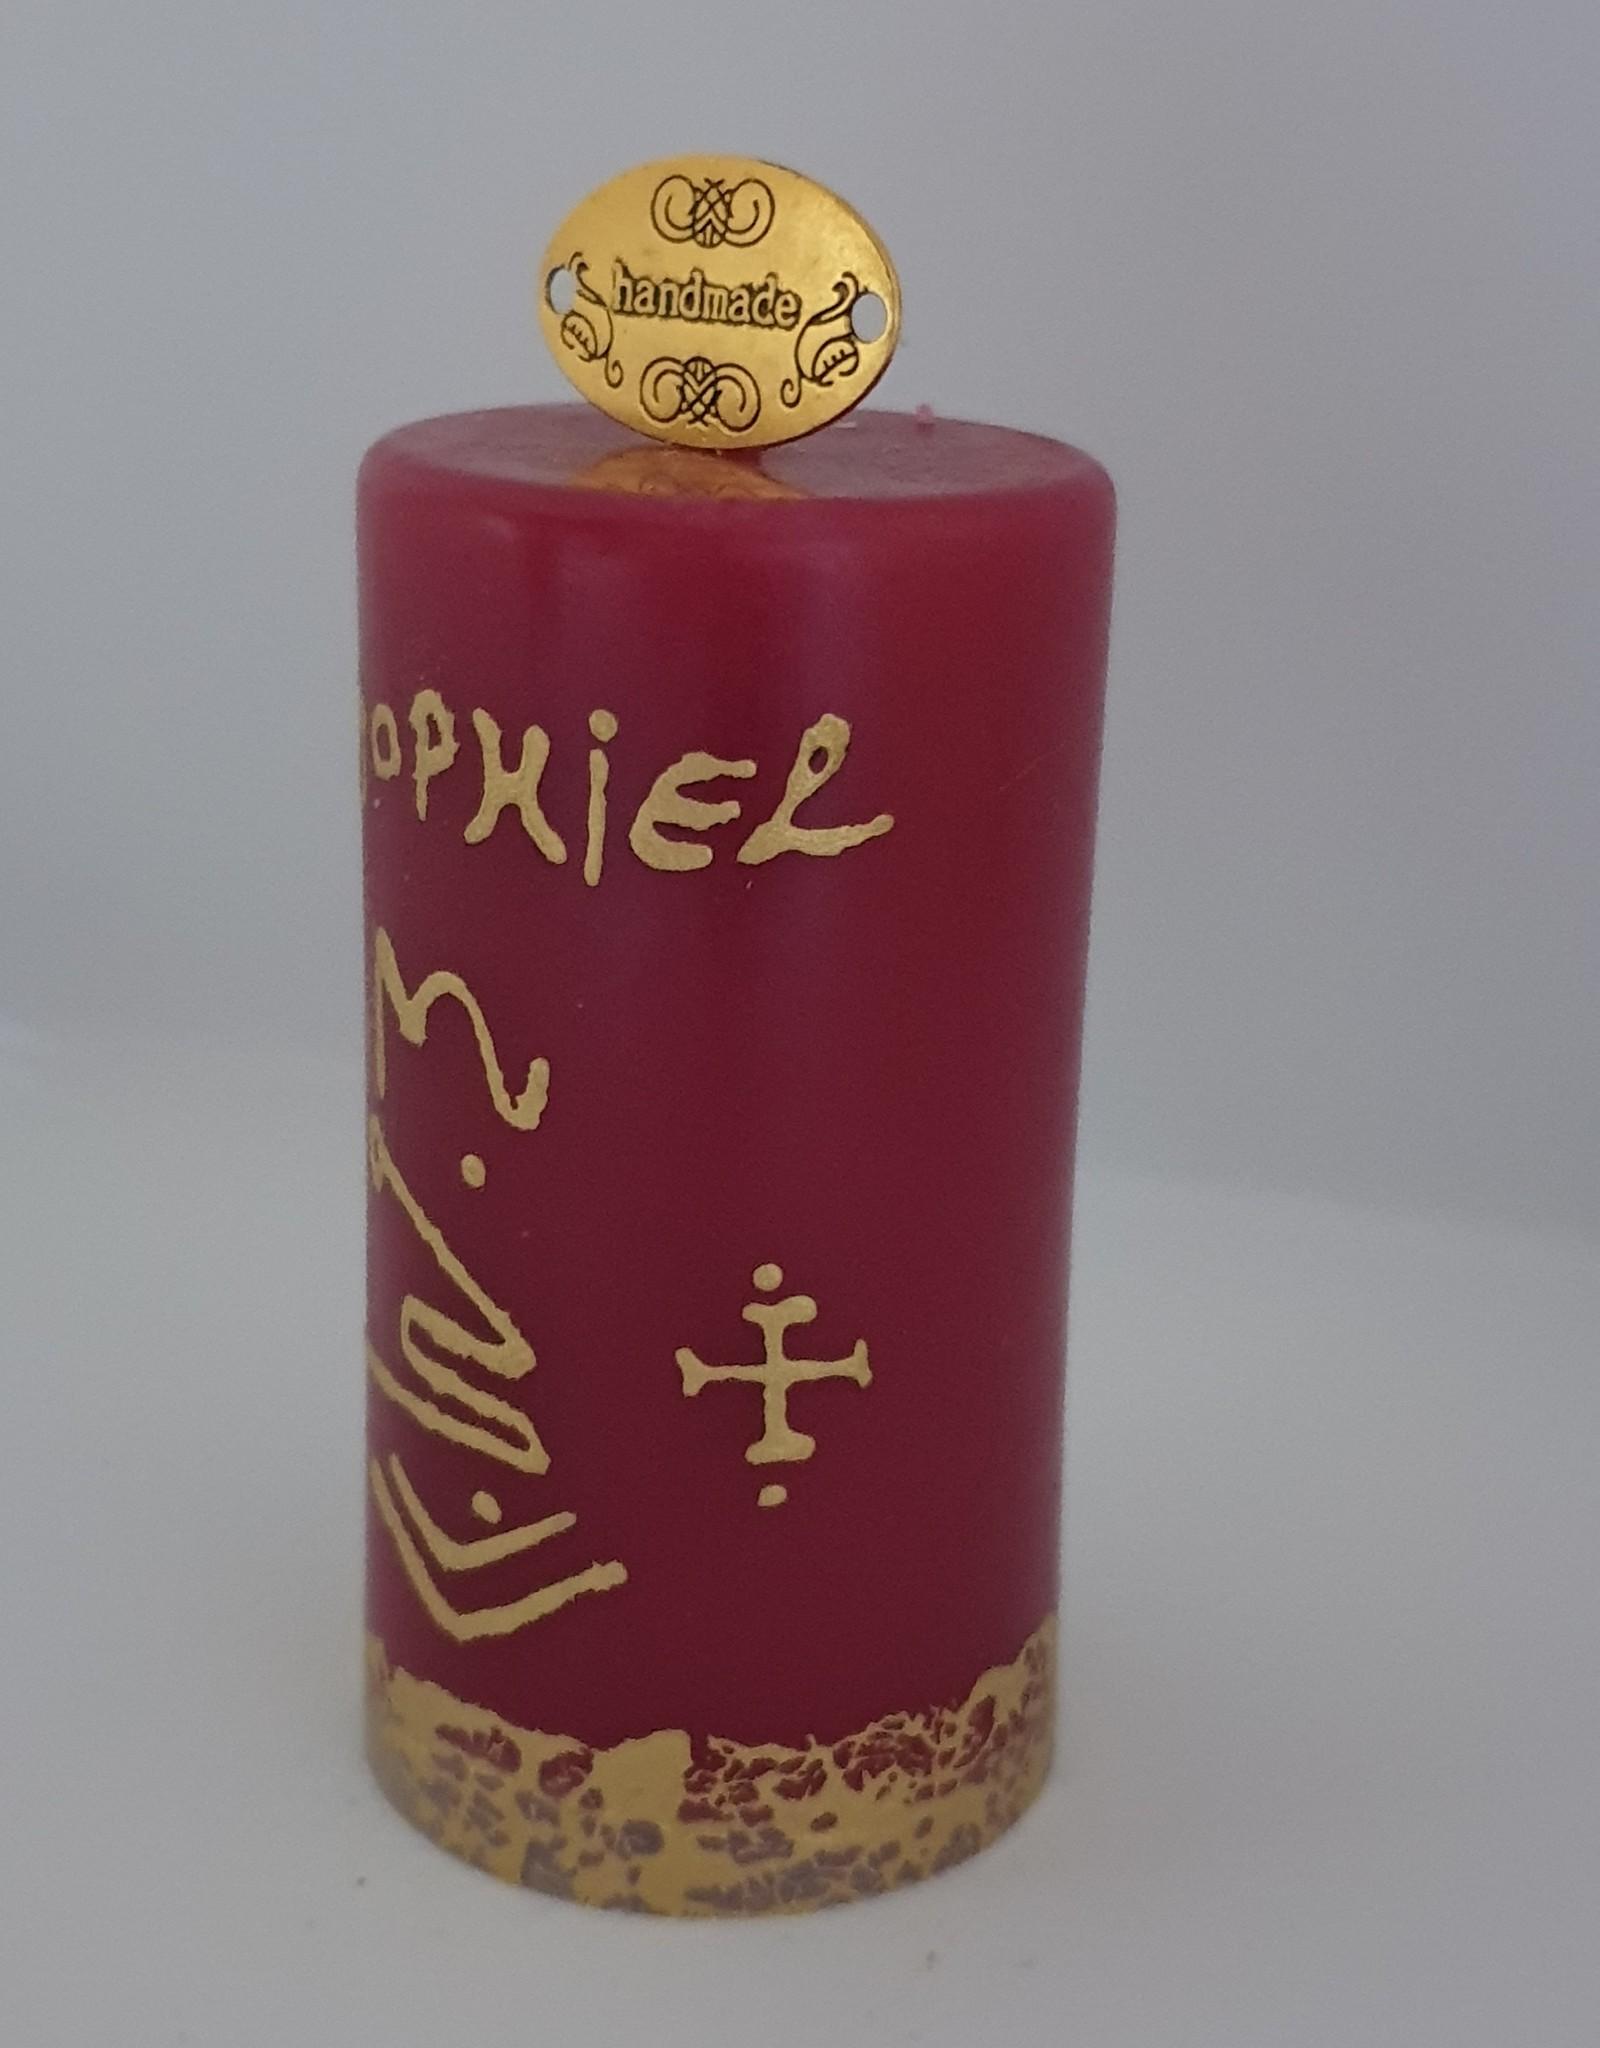 seazido - wevyra archangel Jophiël